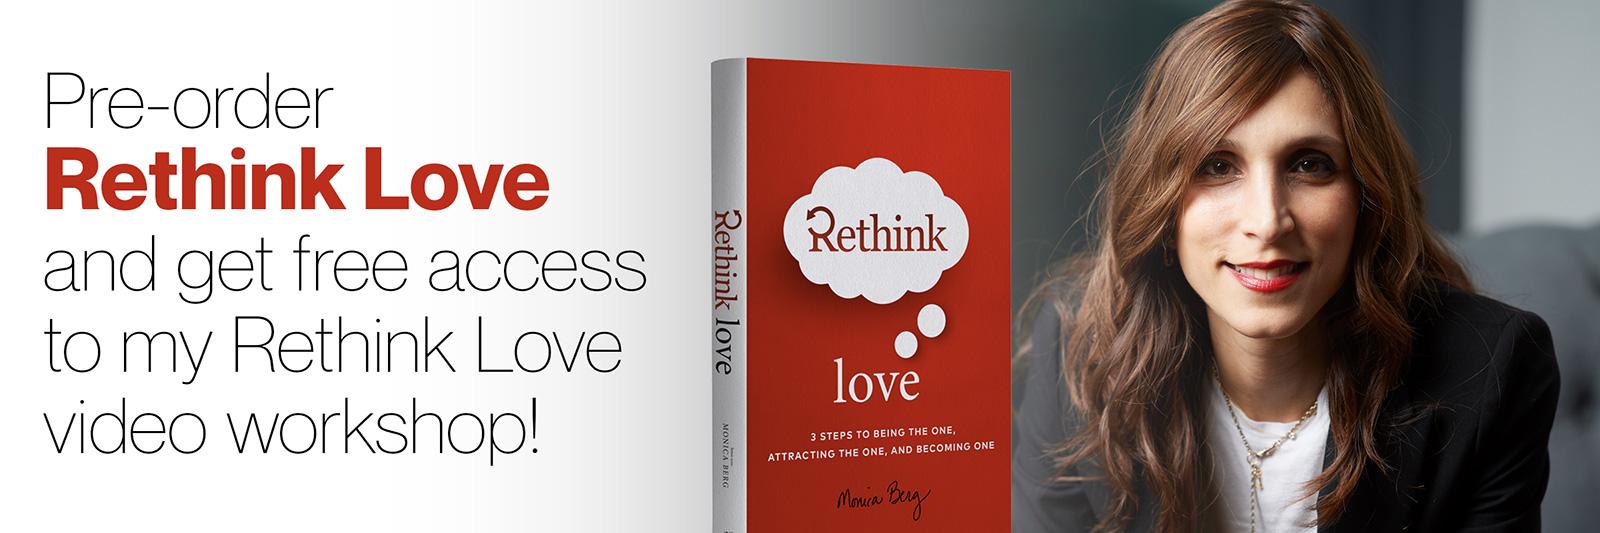 Pre-Order Rethink Love